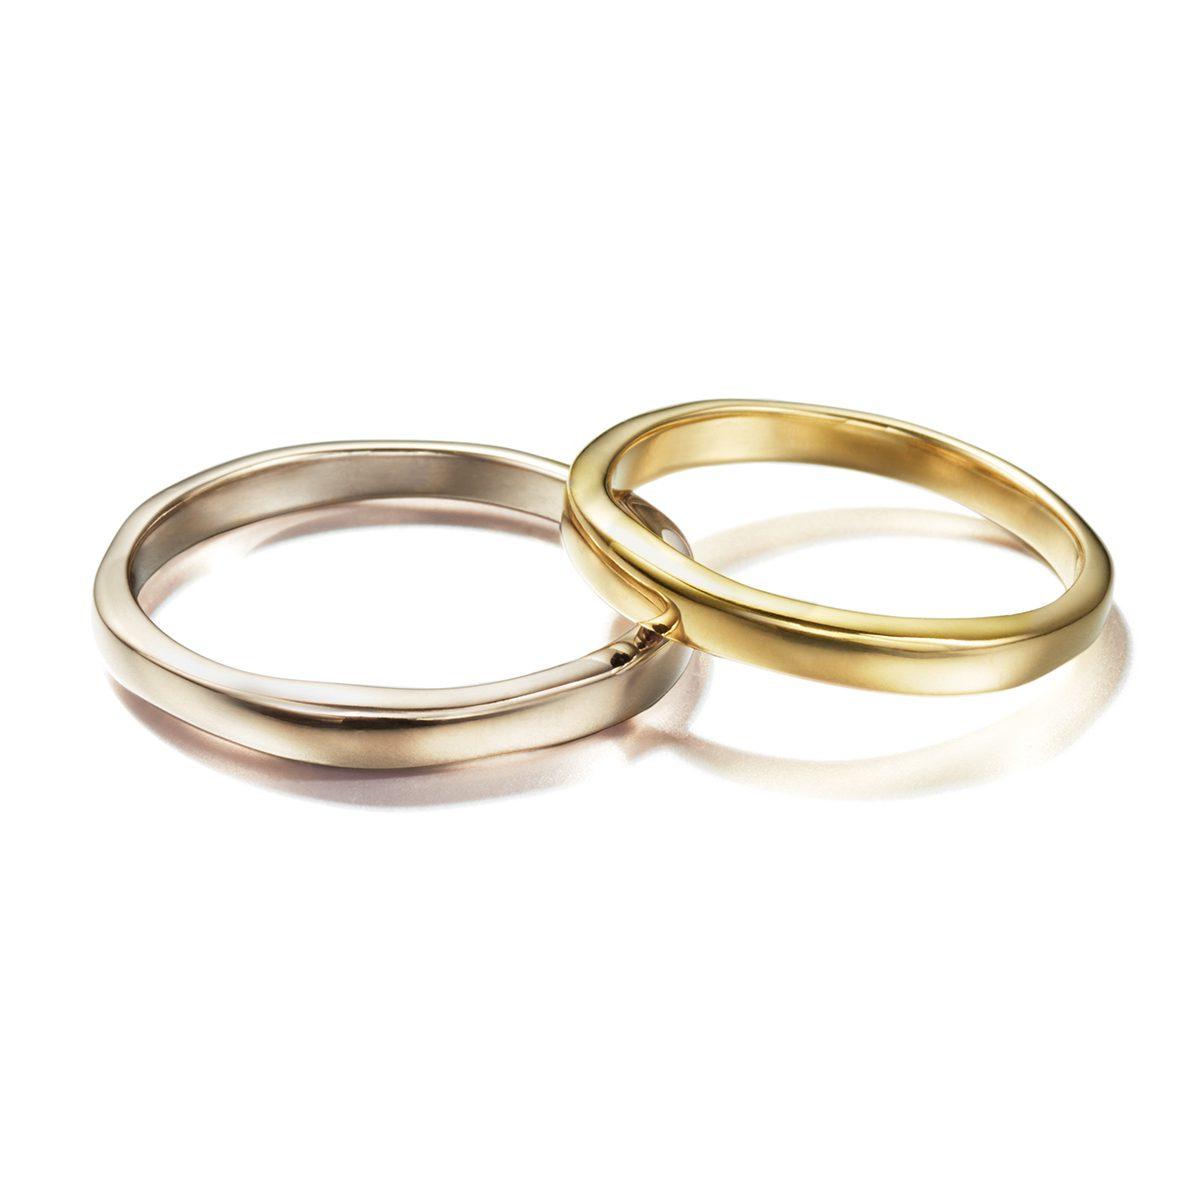 CORINNE HAMAK - Wedding Ⅰ Marriage Rings